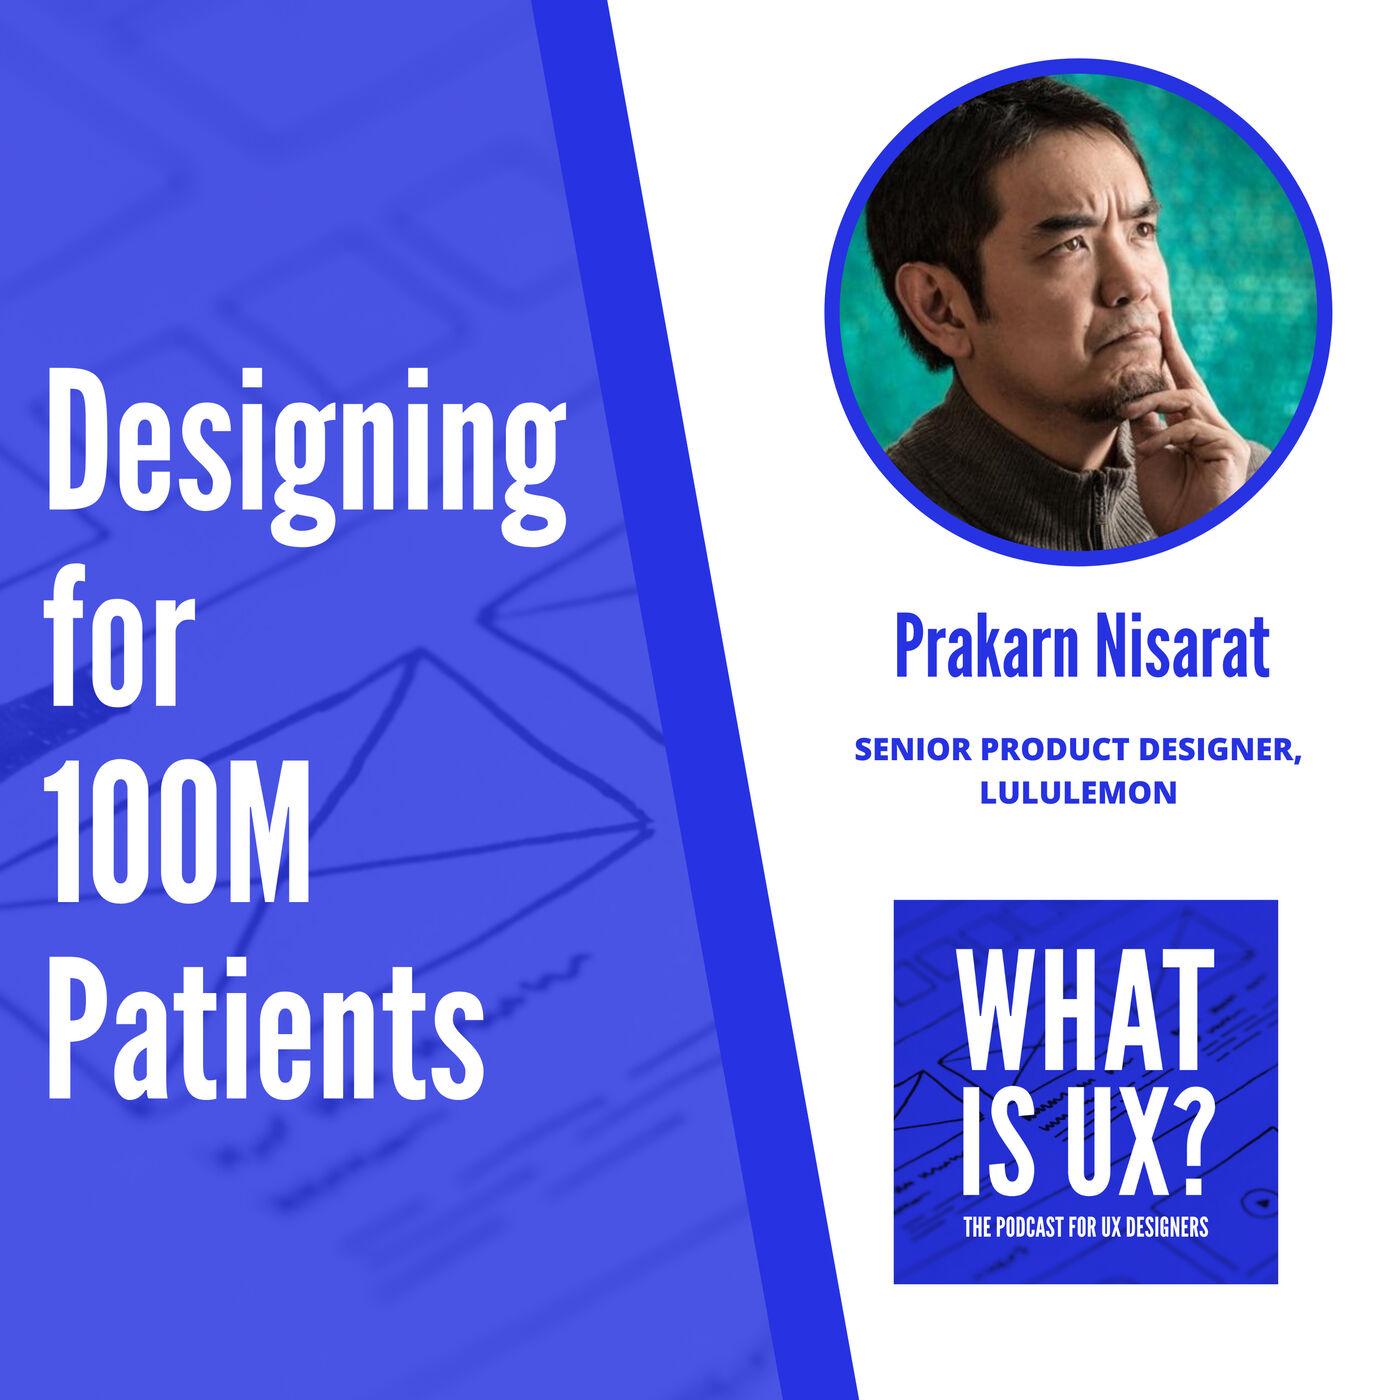 S1E3 Designing for 100M Patients with Prak Nisarat